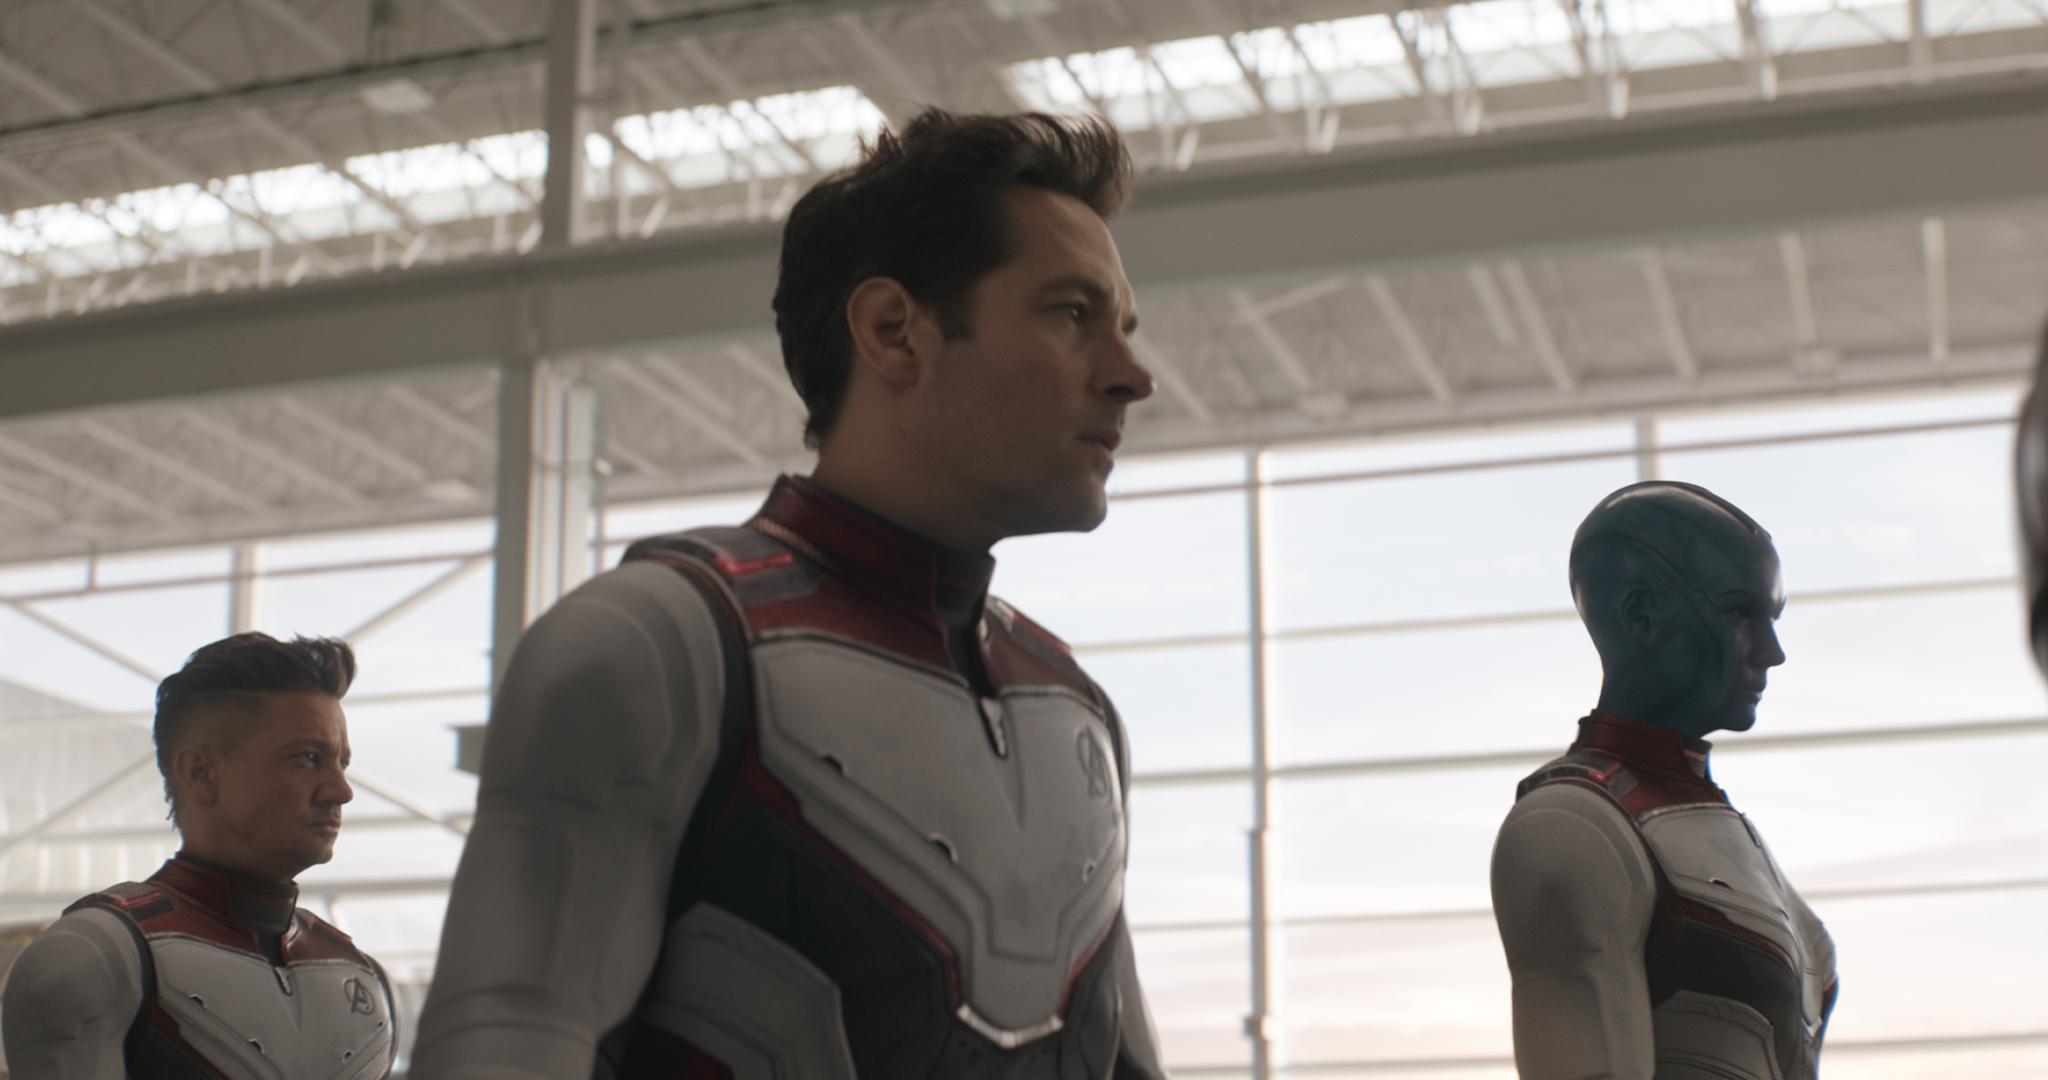 Ant-Man flanked by Hawkeye and Nebula in Avengers: Endgame.